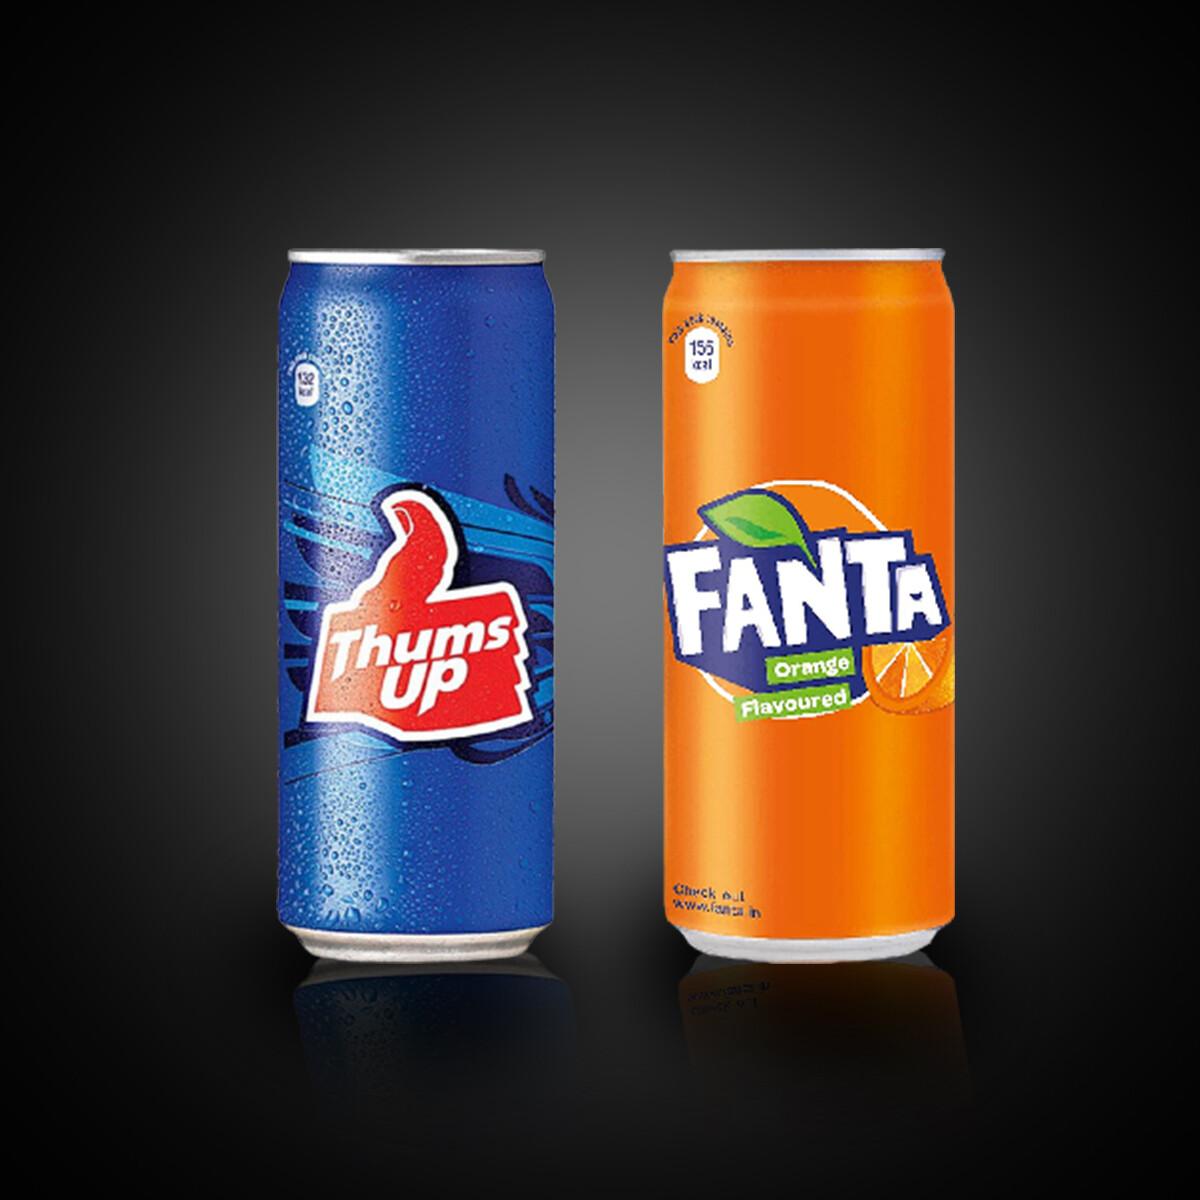 Favourites (Thumbs Up, Fanta)